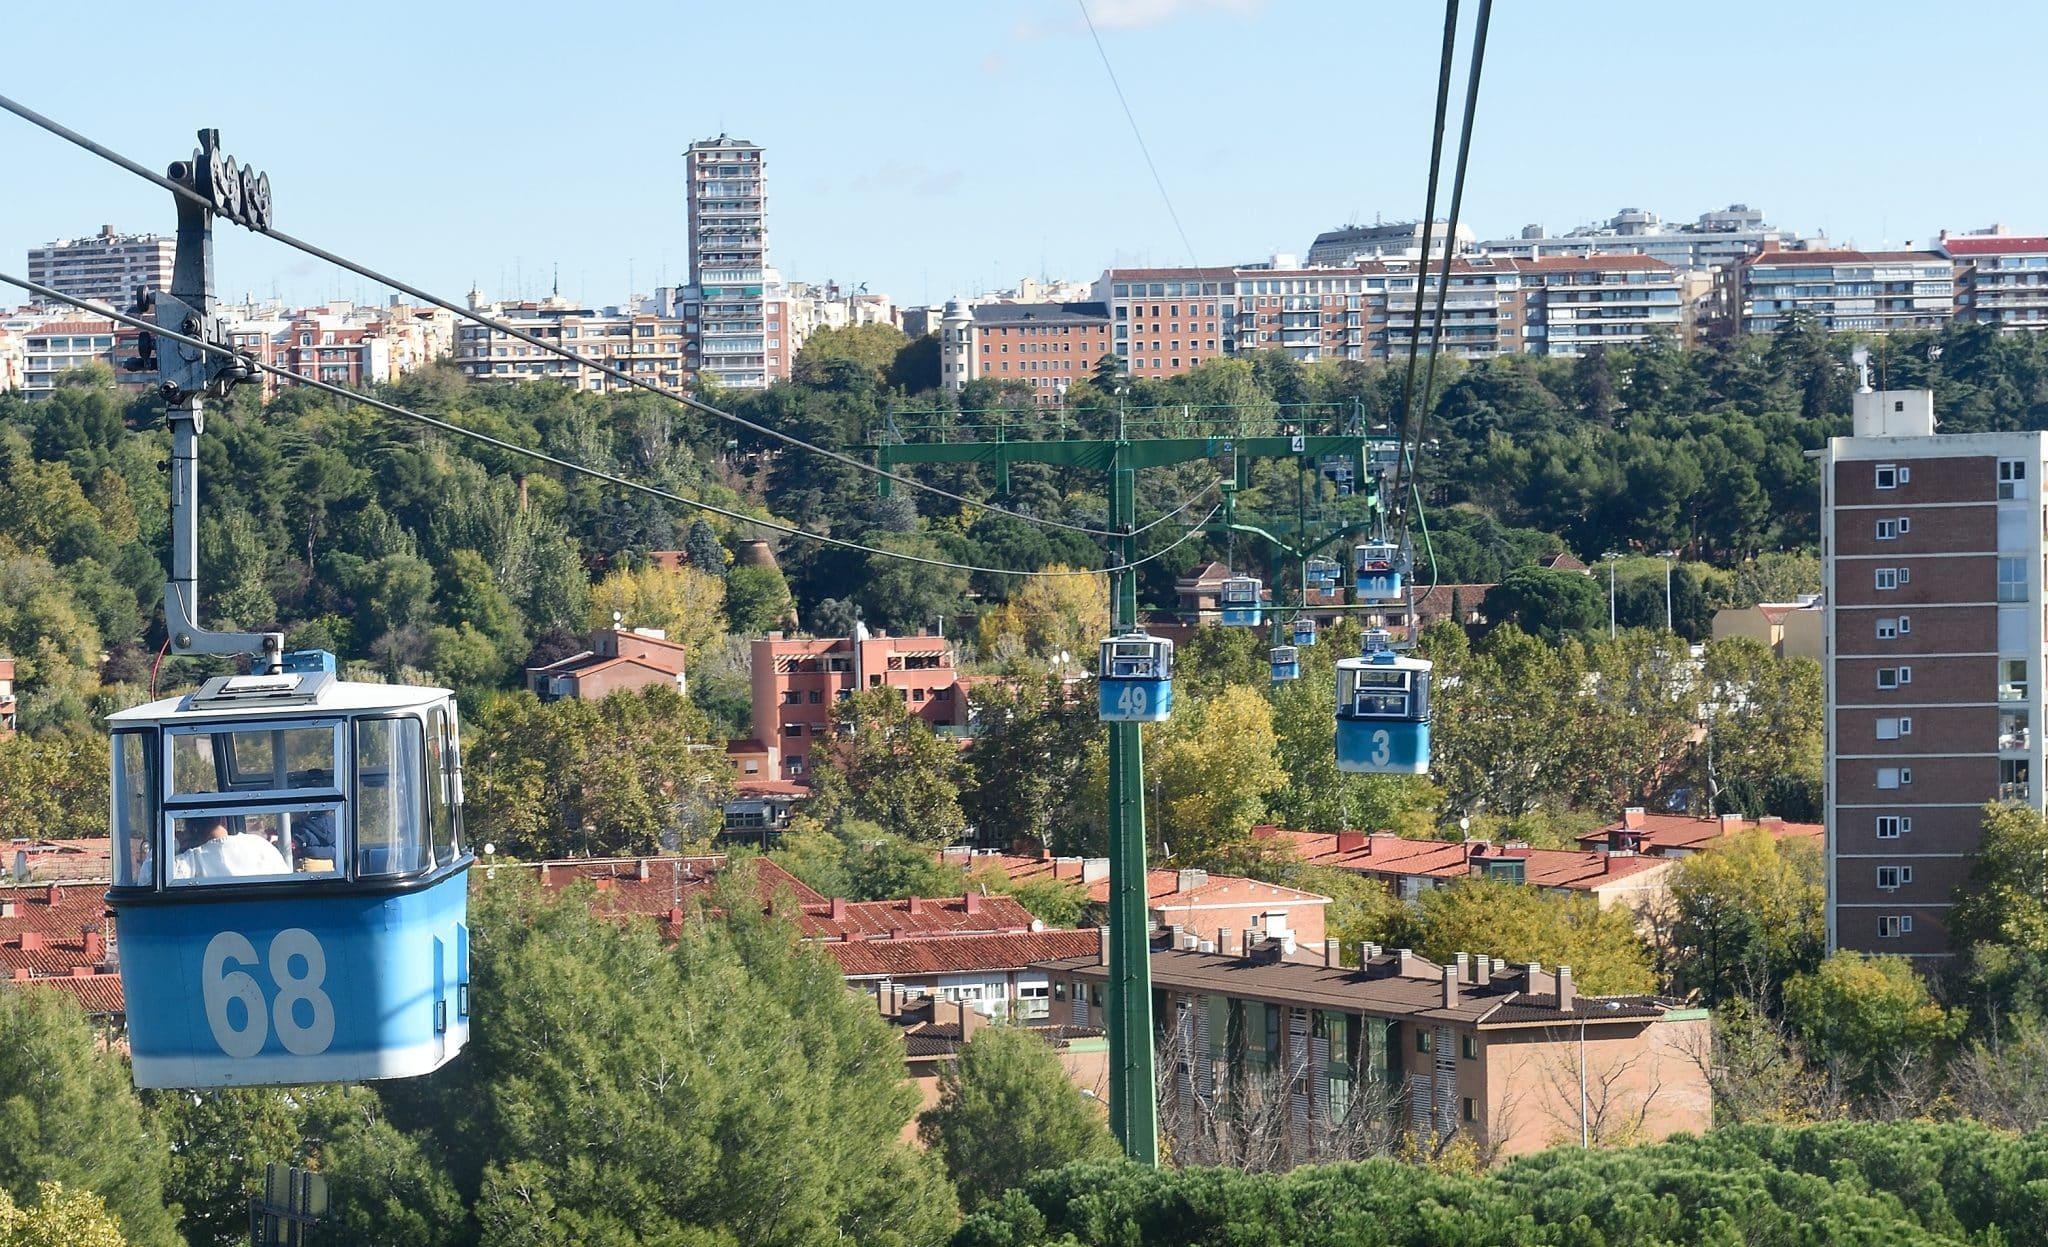 Teleférico_de_Madrid visiter